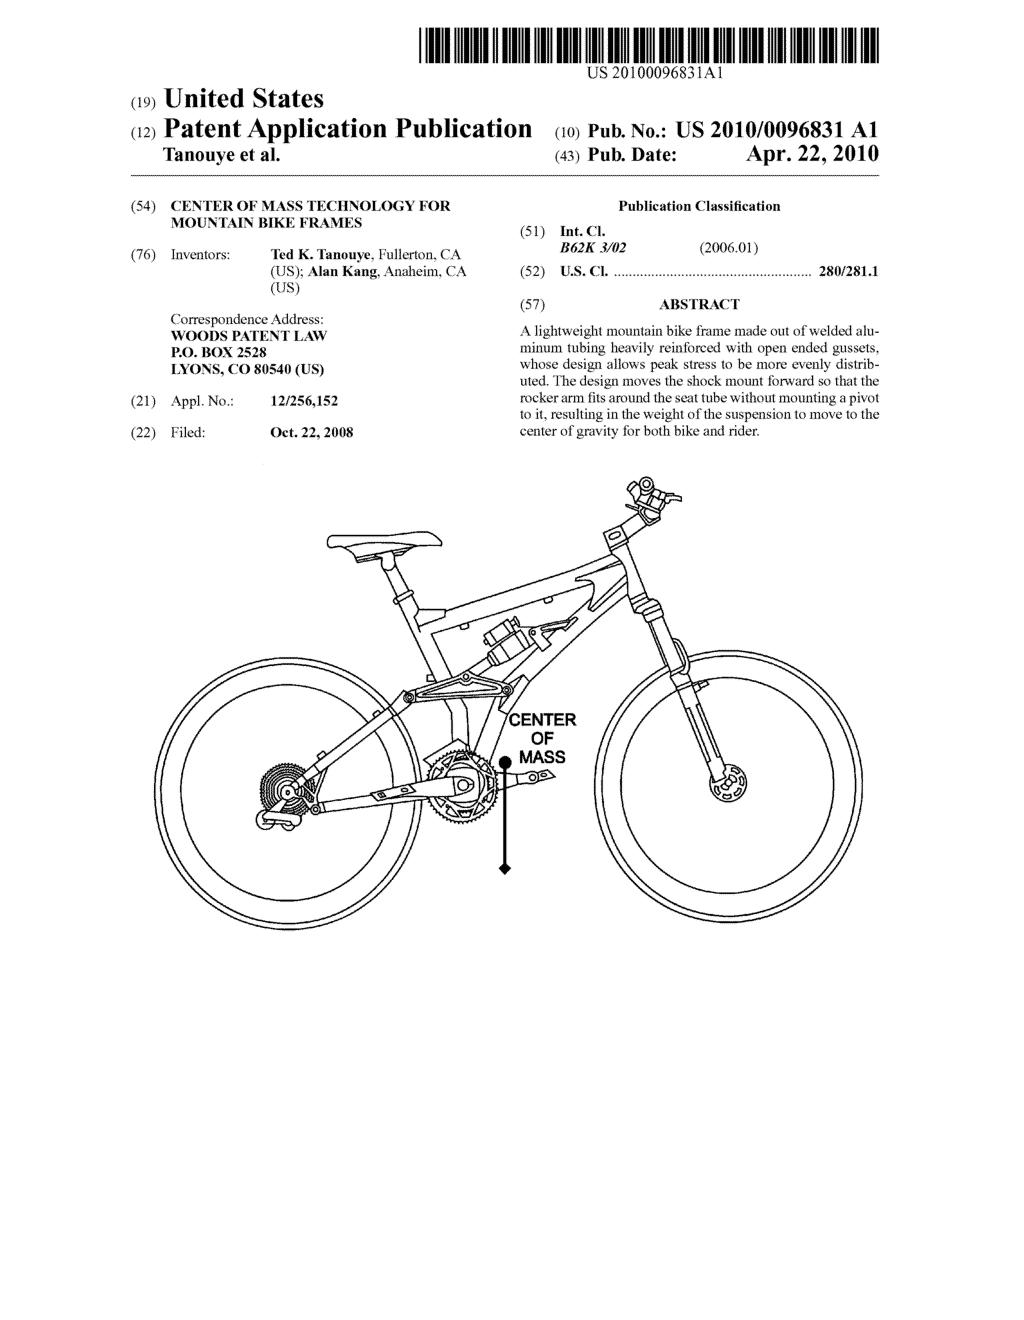 Pleasant Center Of Mass Technology For Mountain Bike Frames Diagram Wiring Database Gramgelartorg